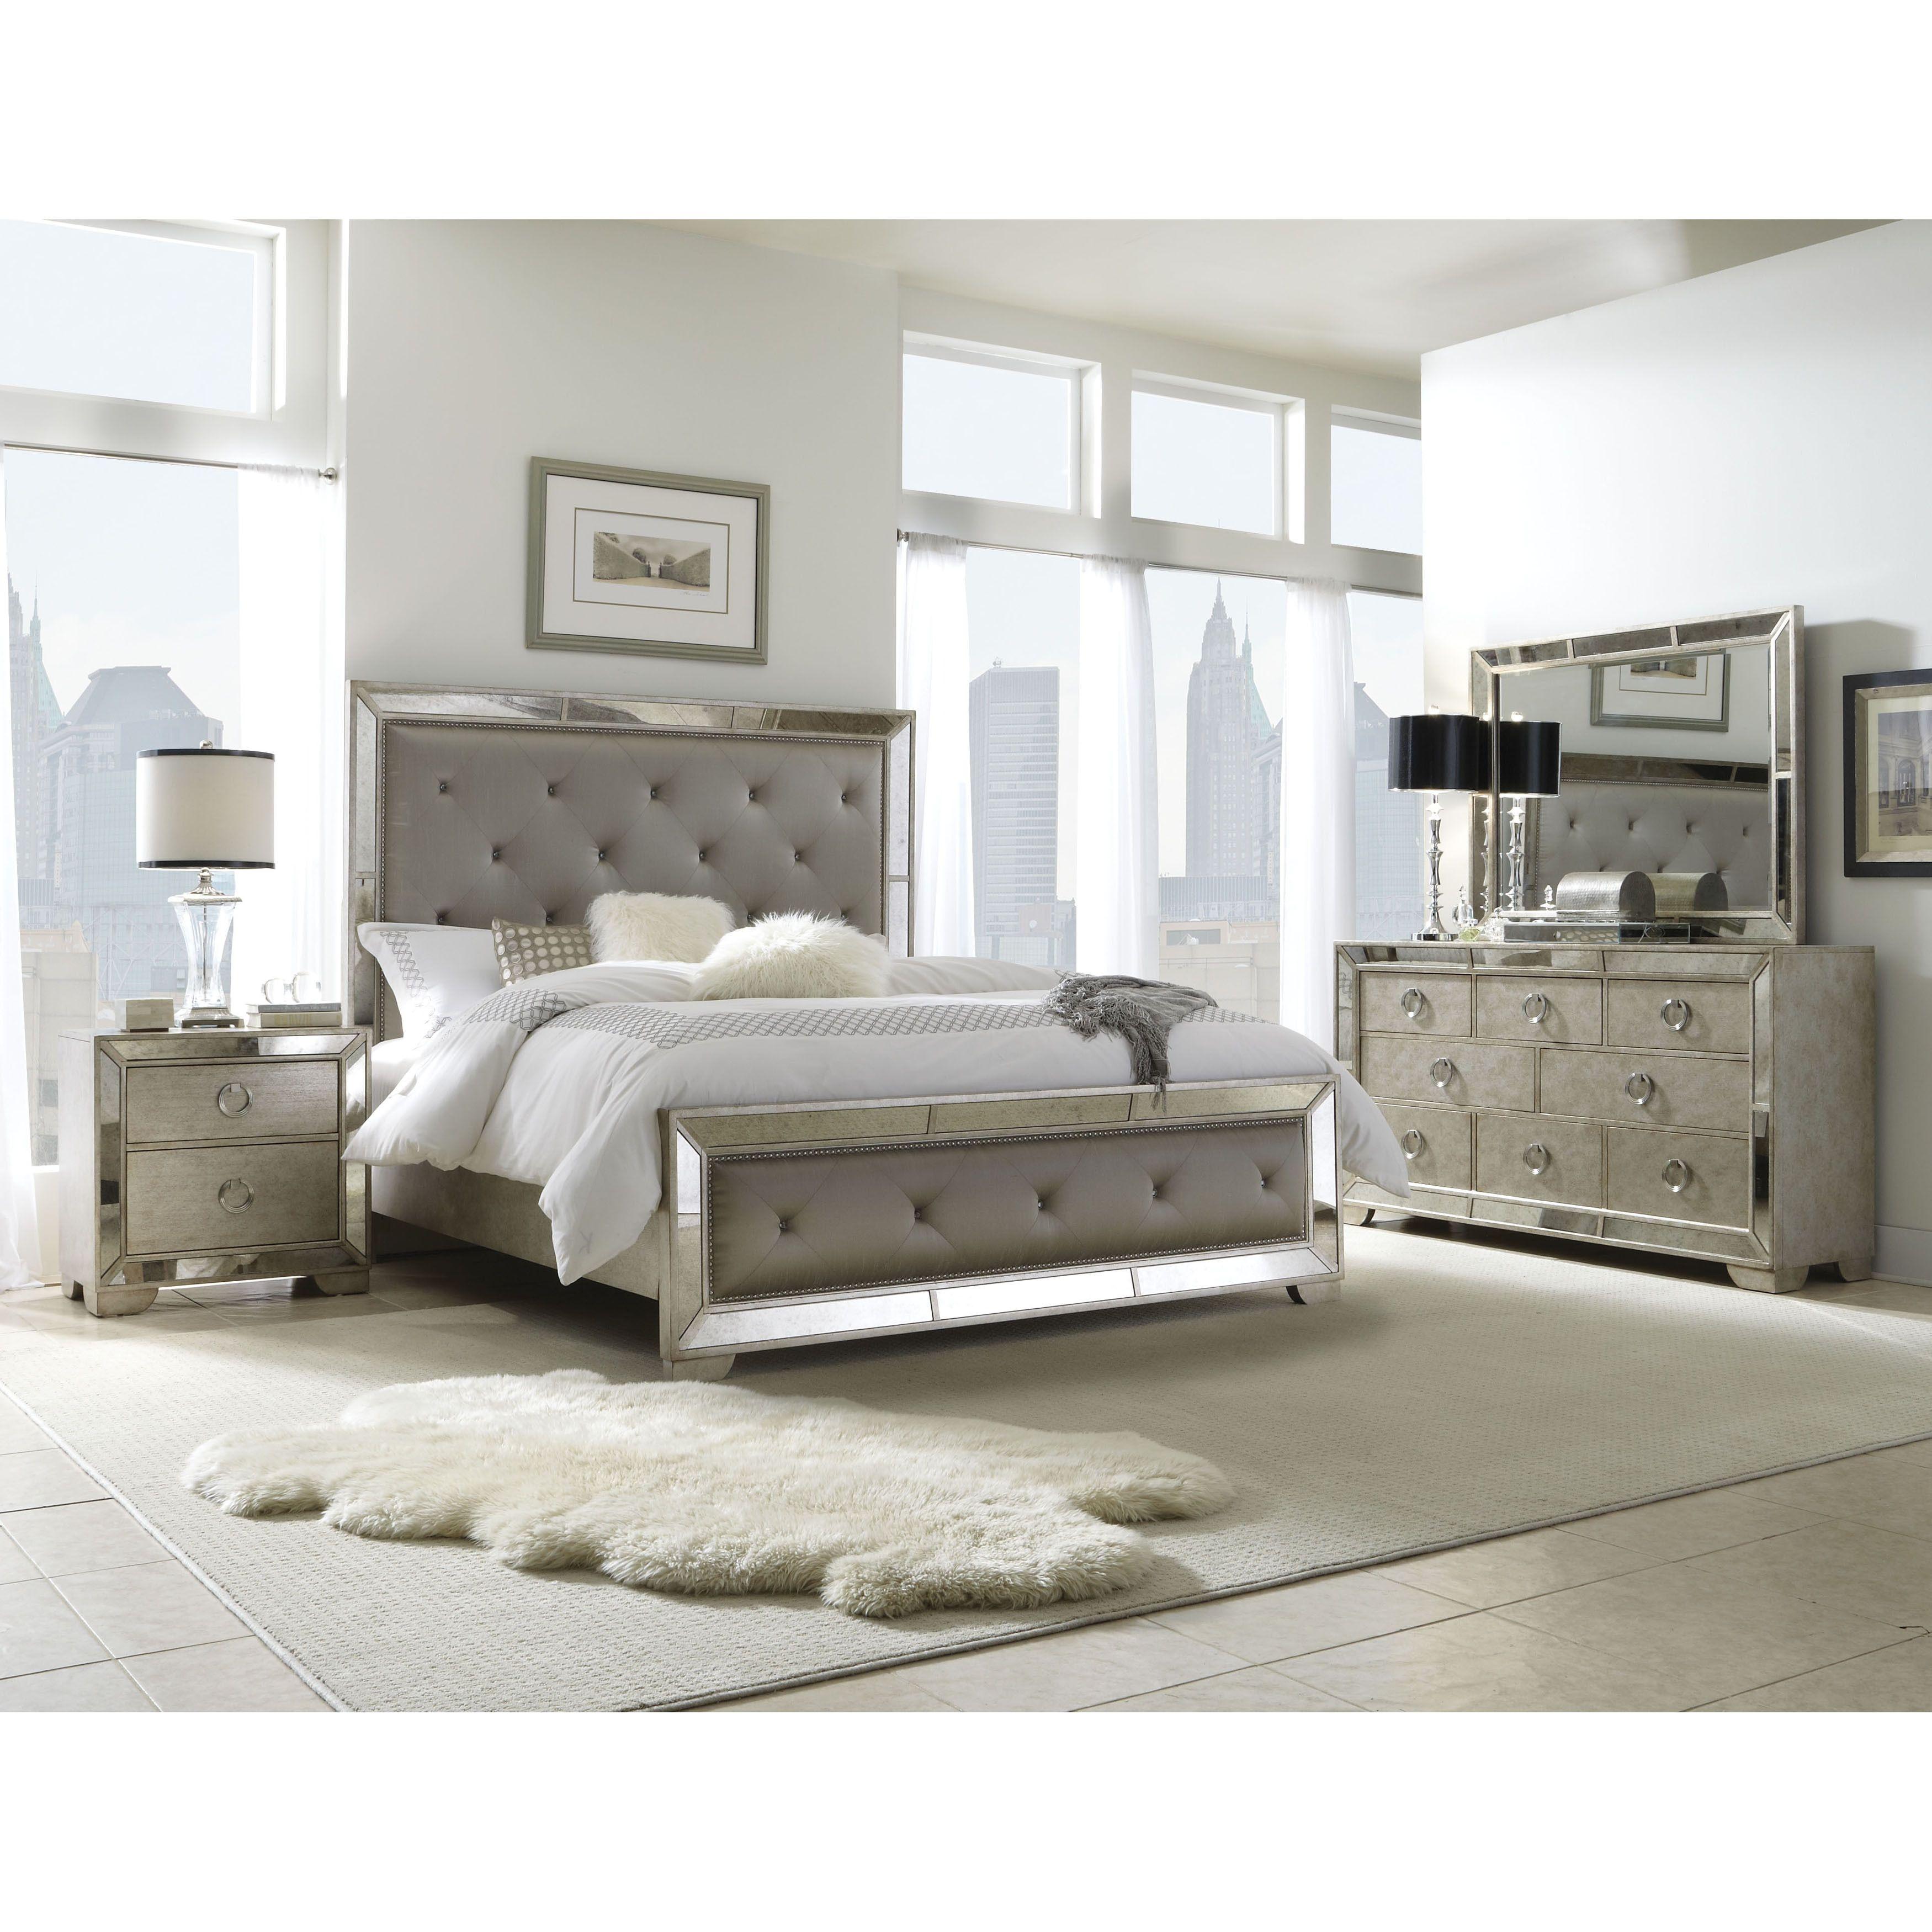 Ordinaire Bedroom Furniture Sets | ... Size Bedroom Set   Overstock Shopping   Big  Discounts On Bedroom Sets